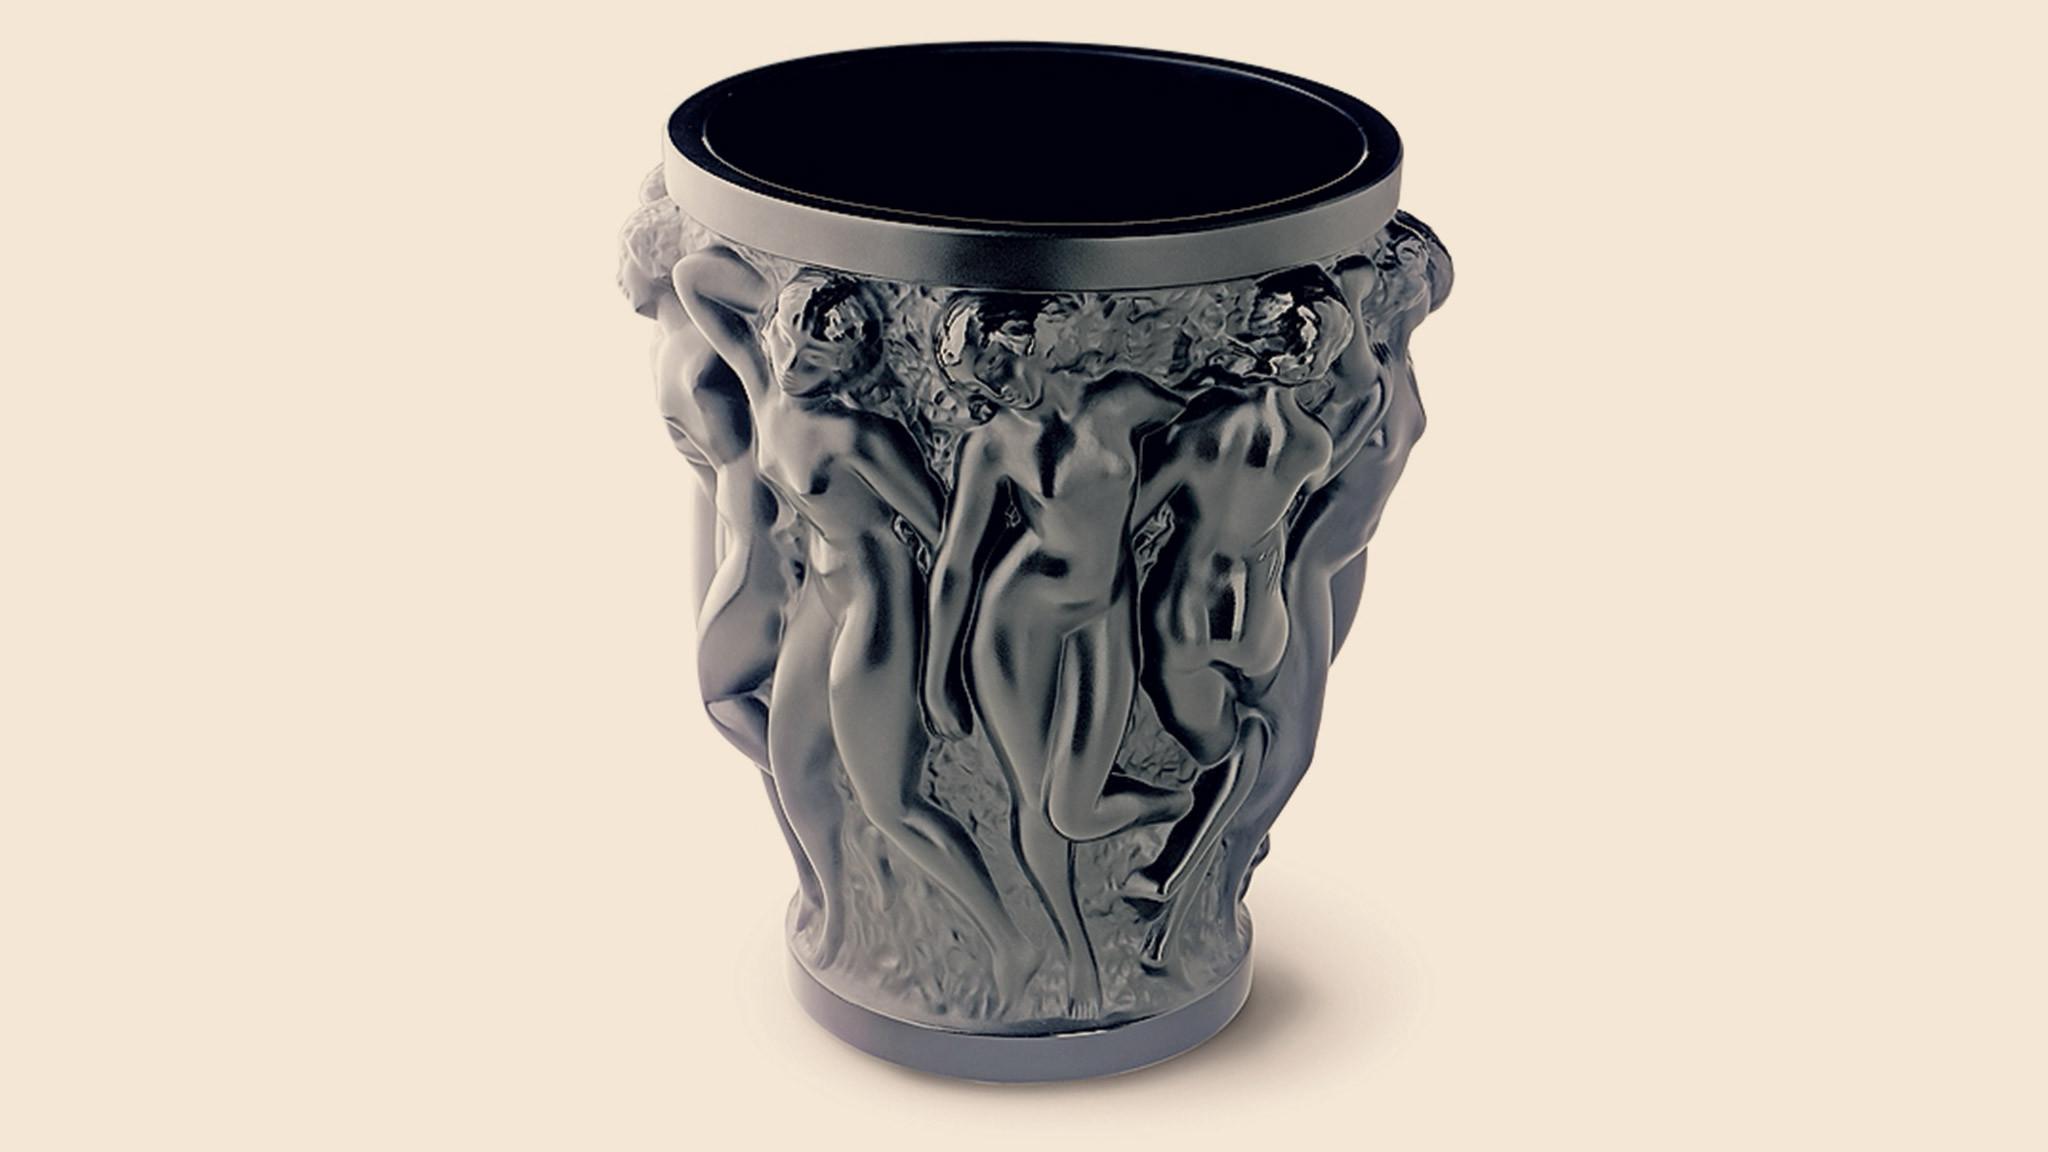 22 Unique Lalique Bacchantes Vase Amber 2021 free download lalique bacchantes vase amber of design classic the bacchantes vase by rena lalique financial times regarding eea49036 f1fb 11e3 9015 00144feabdc0